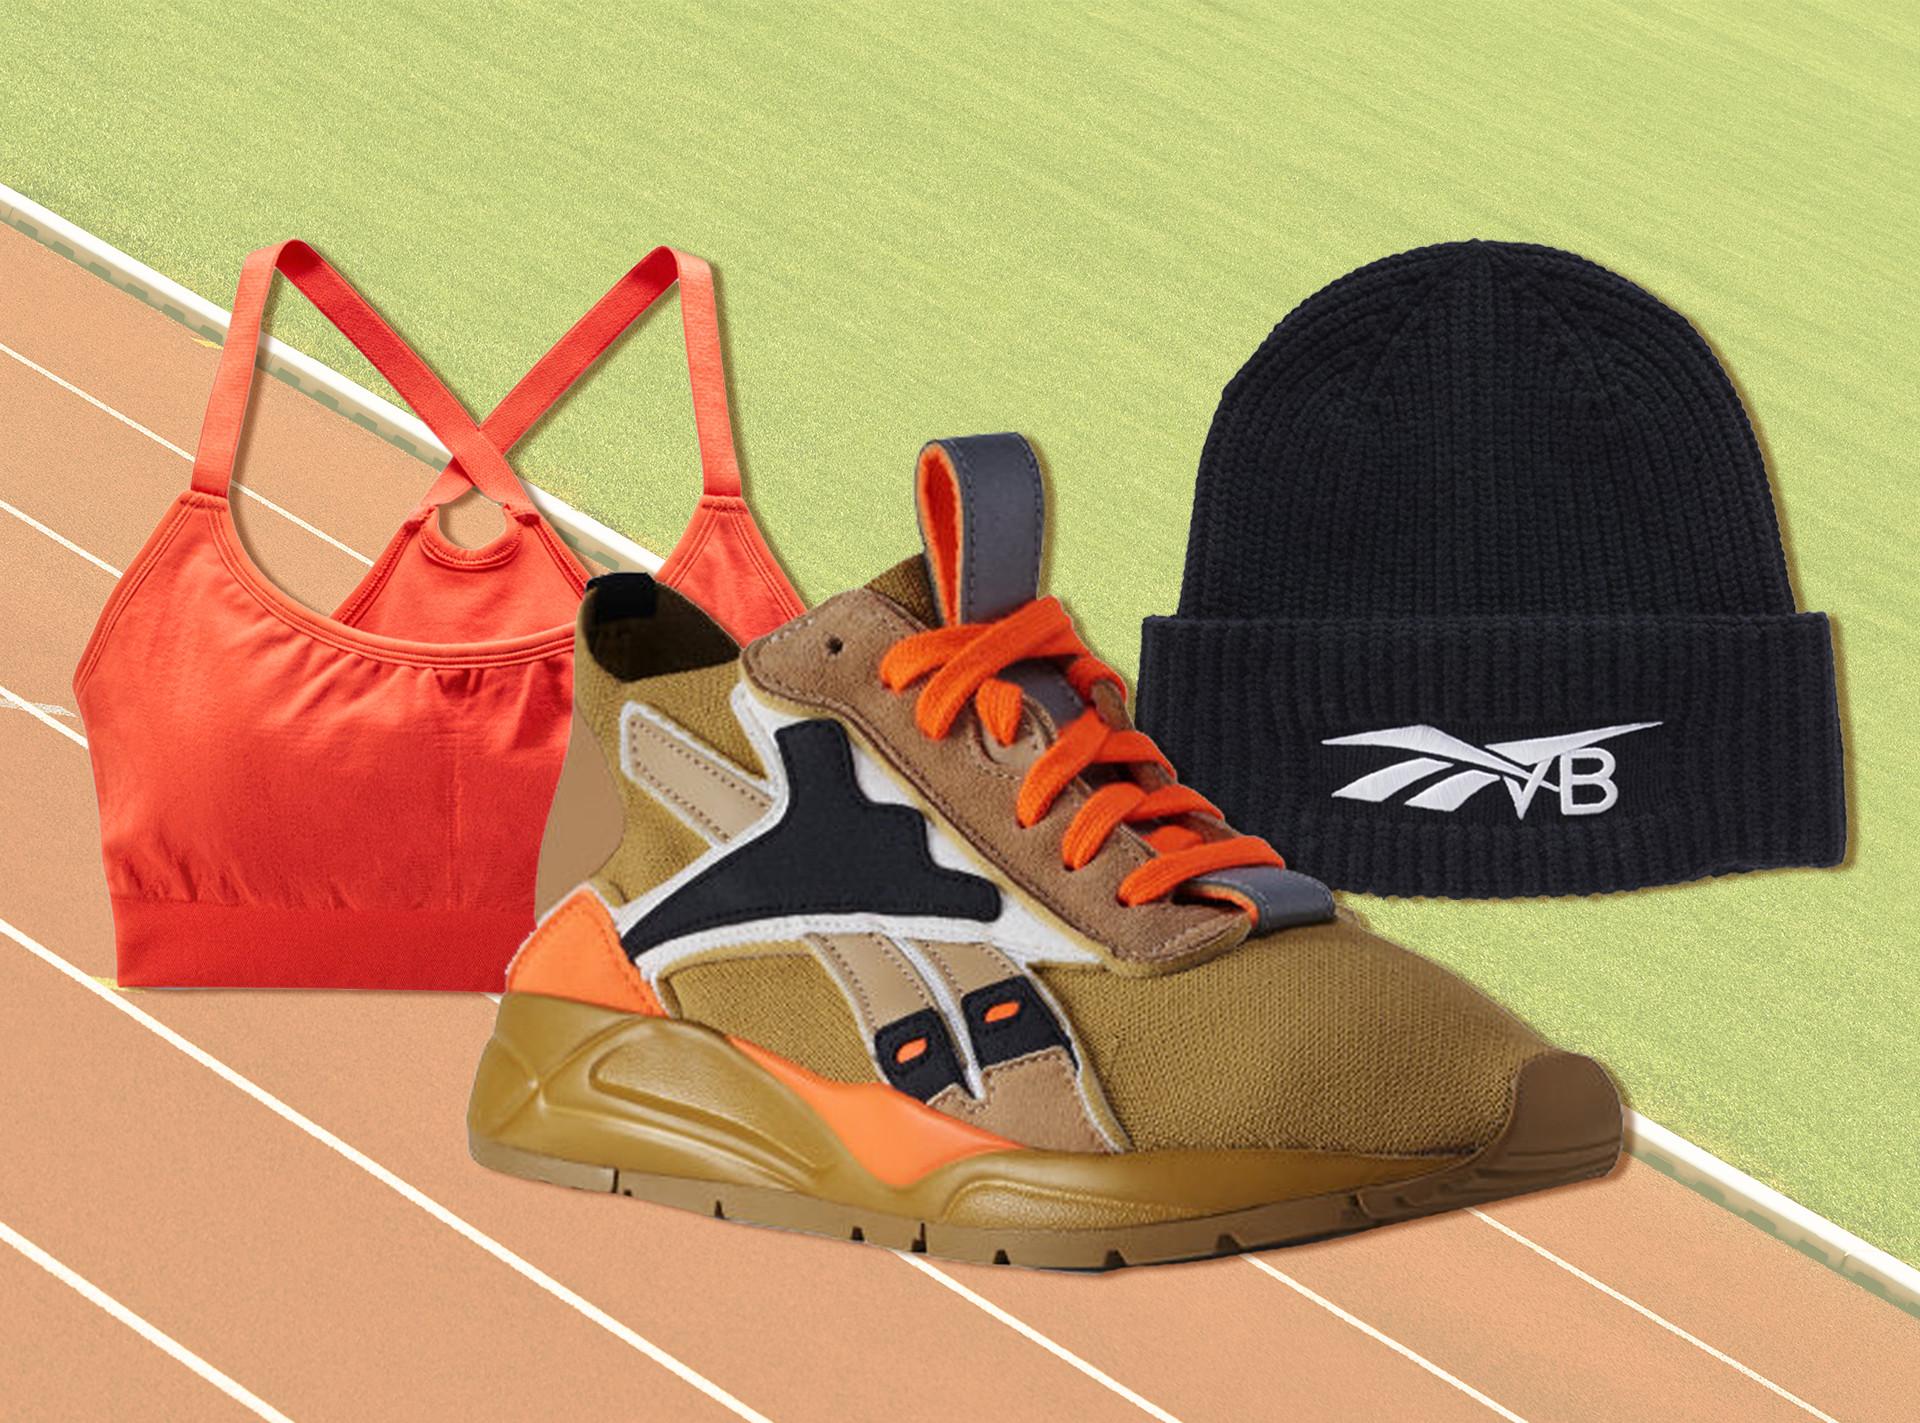 229aba9e9f Shop Our Favorites From Reebok x Victoria Beckham | E! News